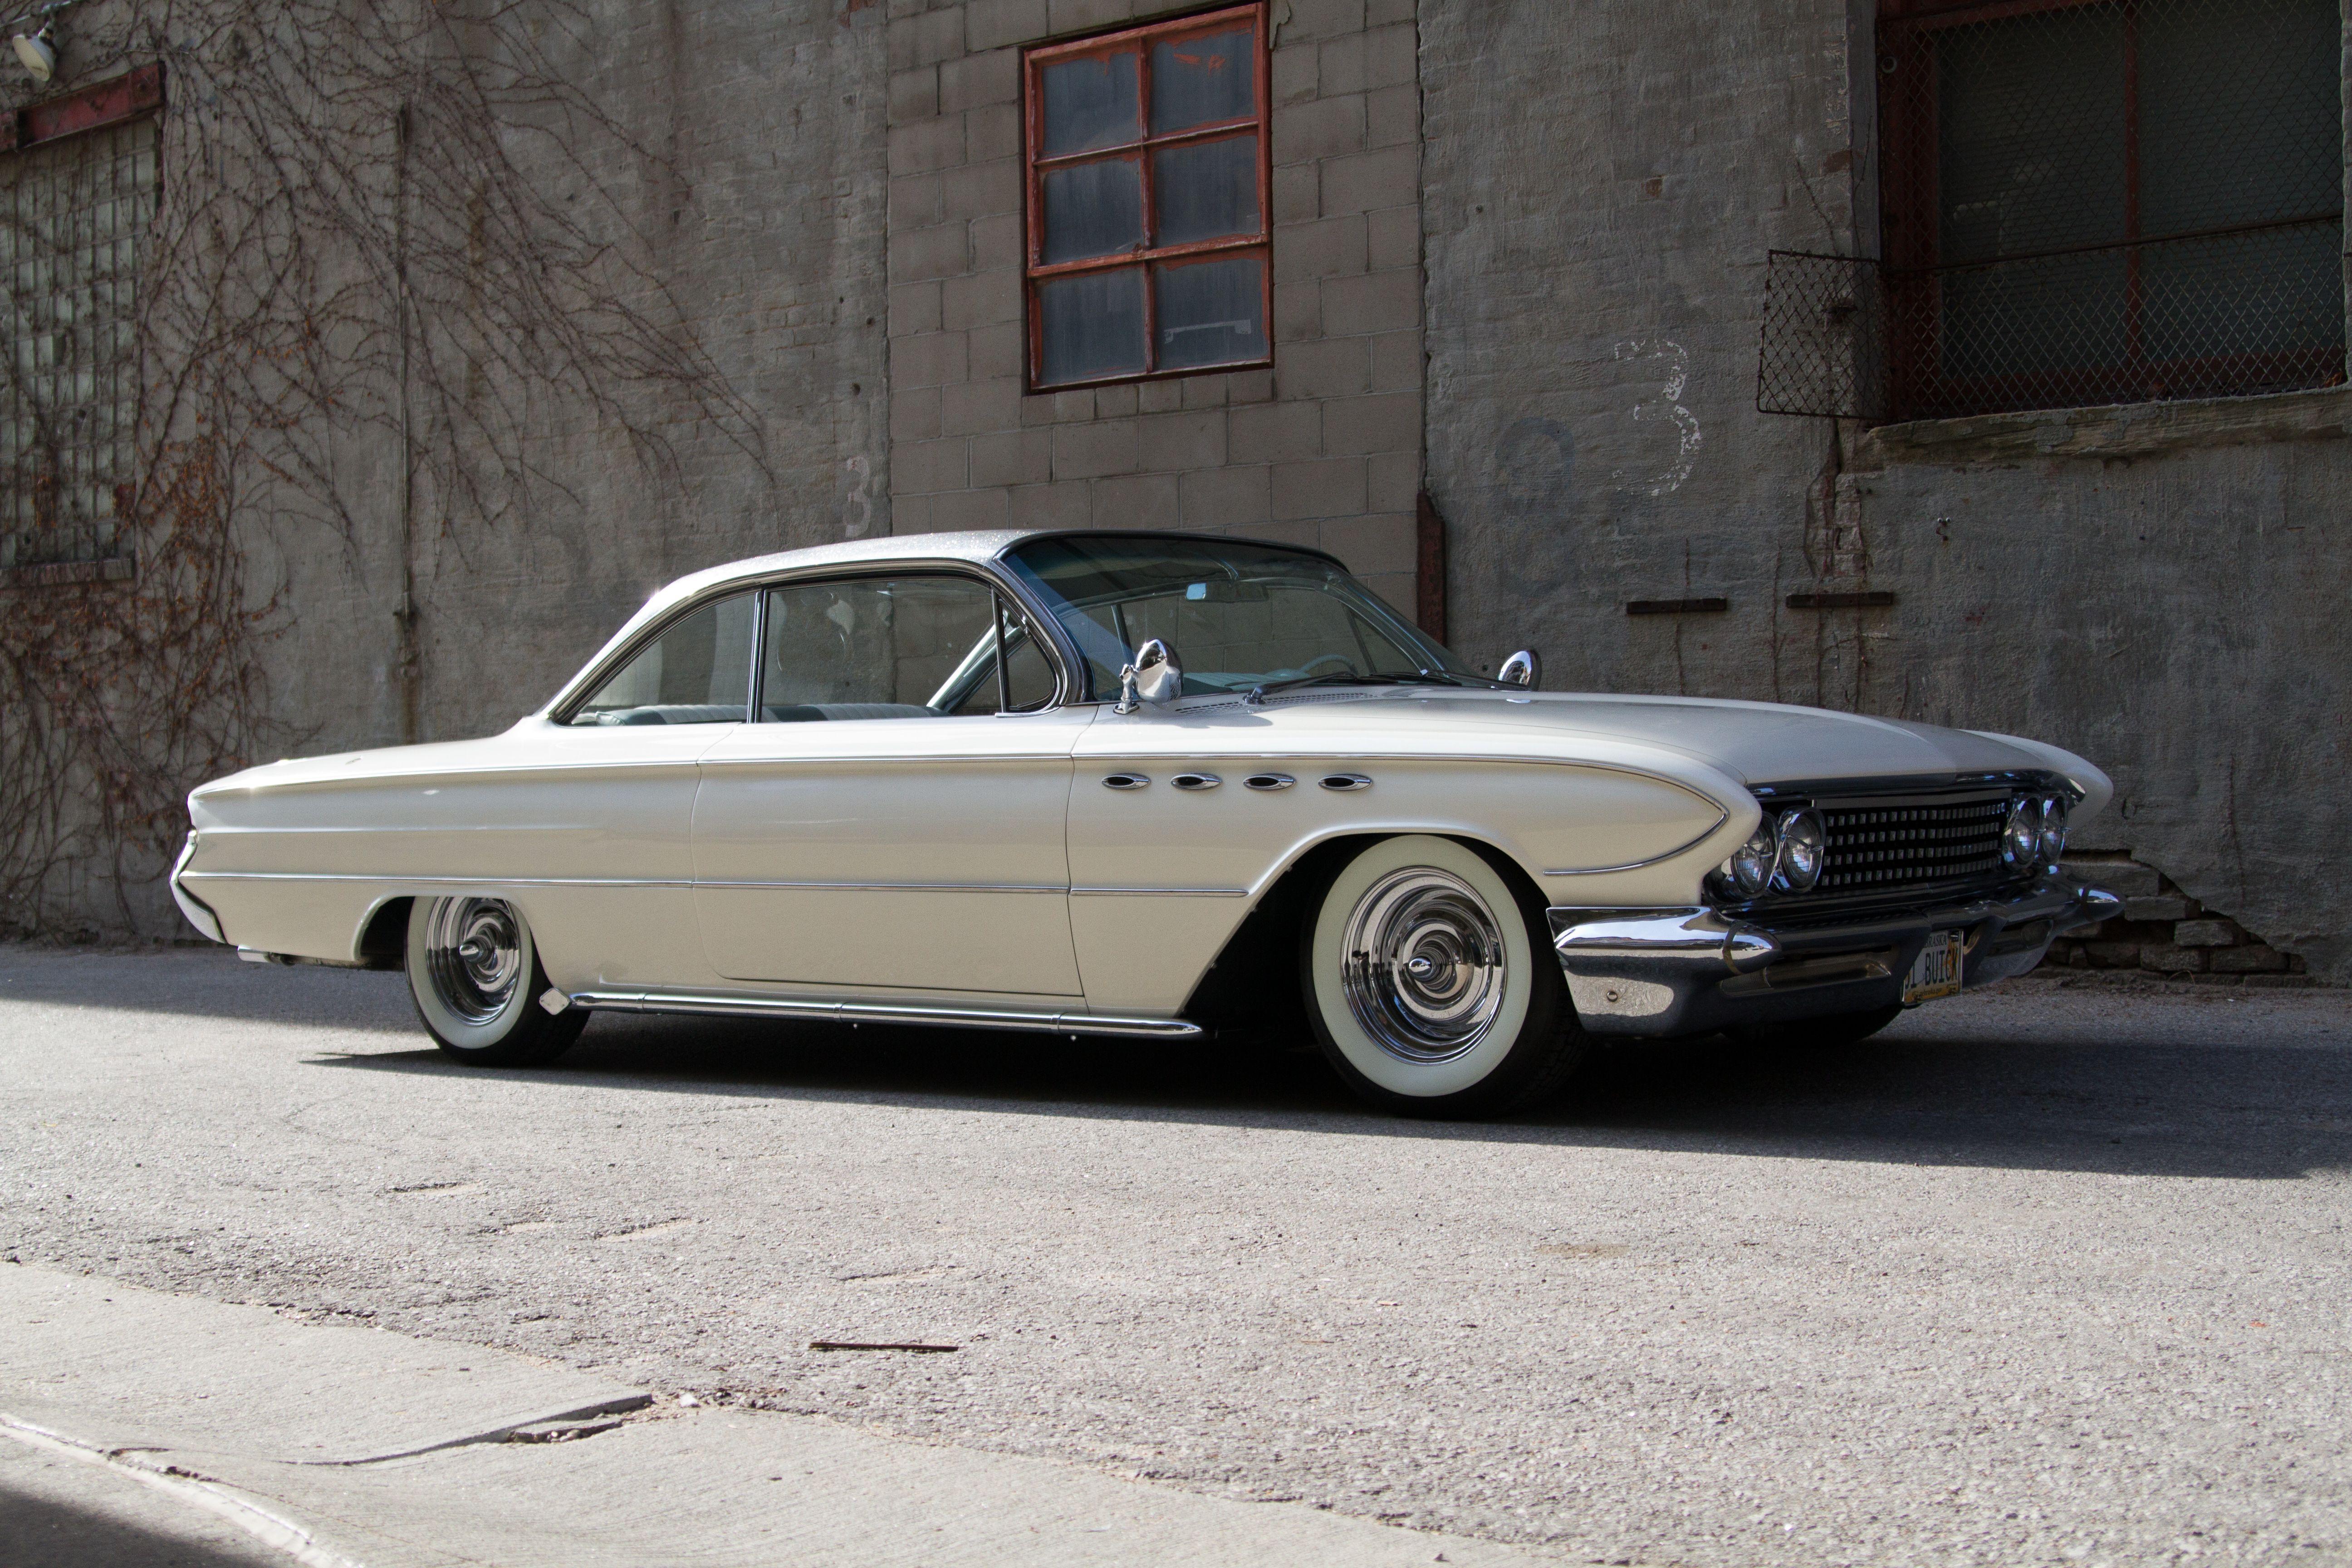 Customized 1961 Buick Invicta Classic Car Restoration Buick Cars Cool Cars